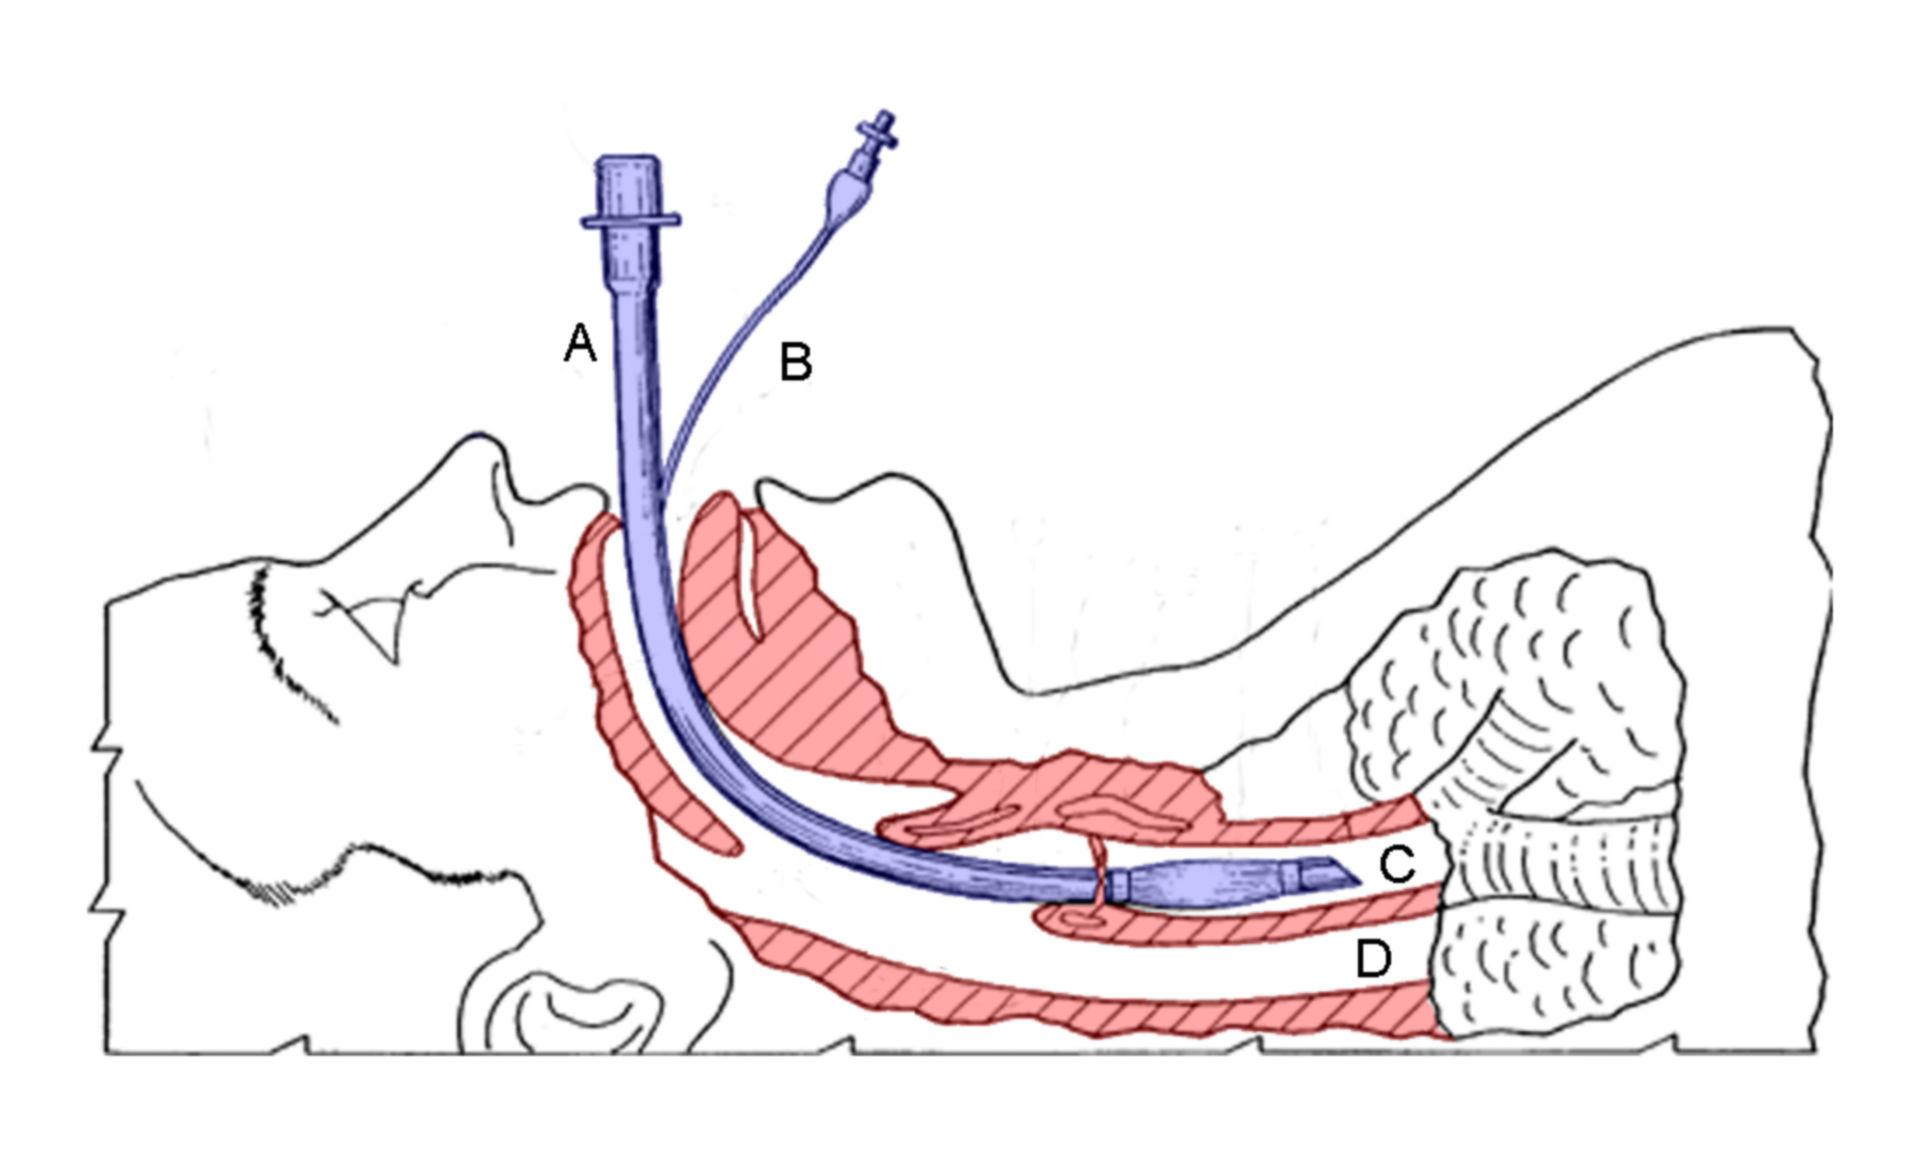 Intubación endotraqueal (esquema)